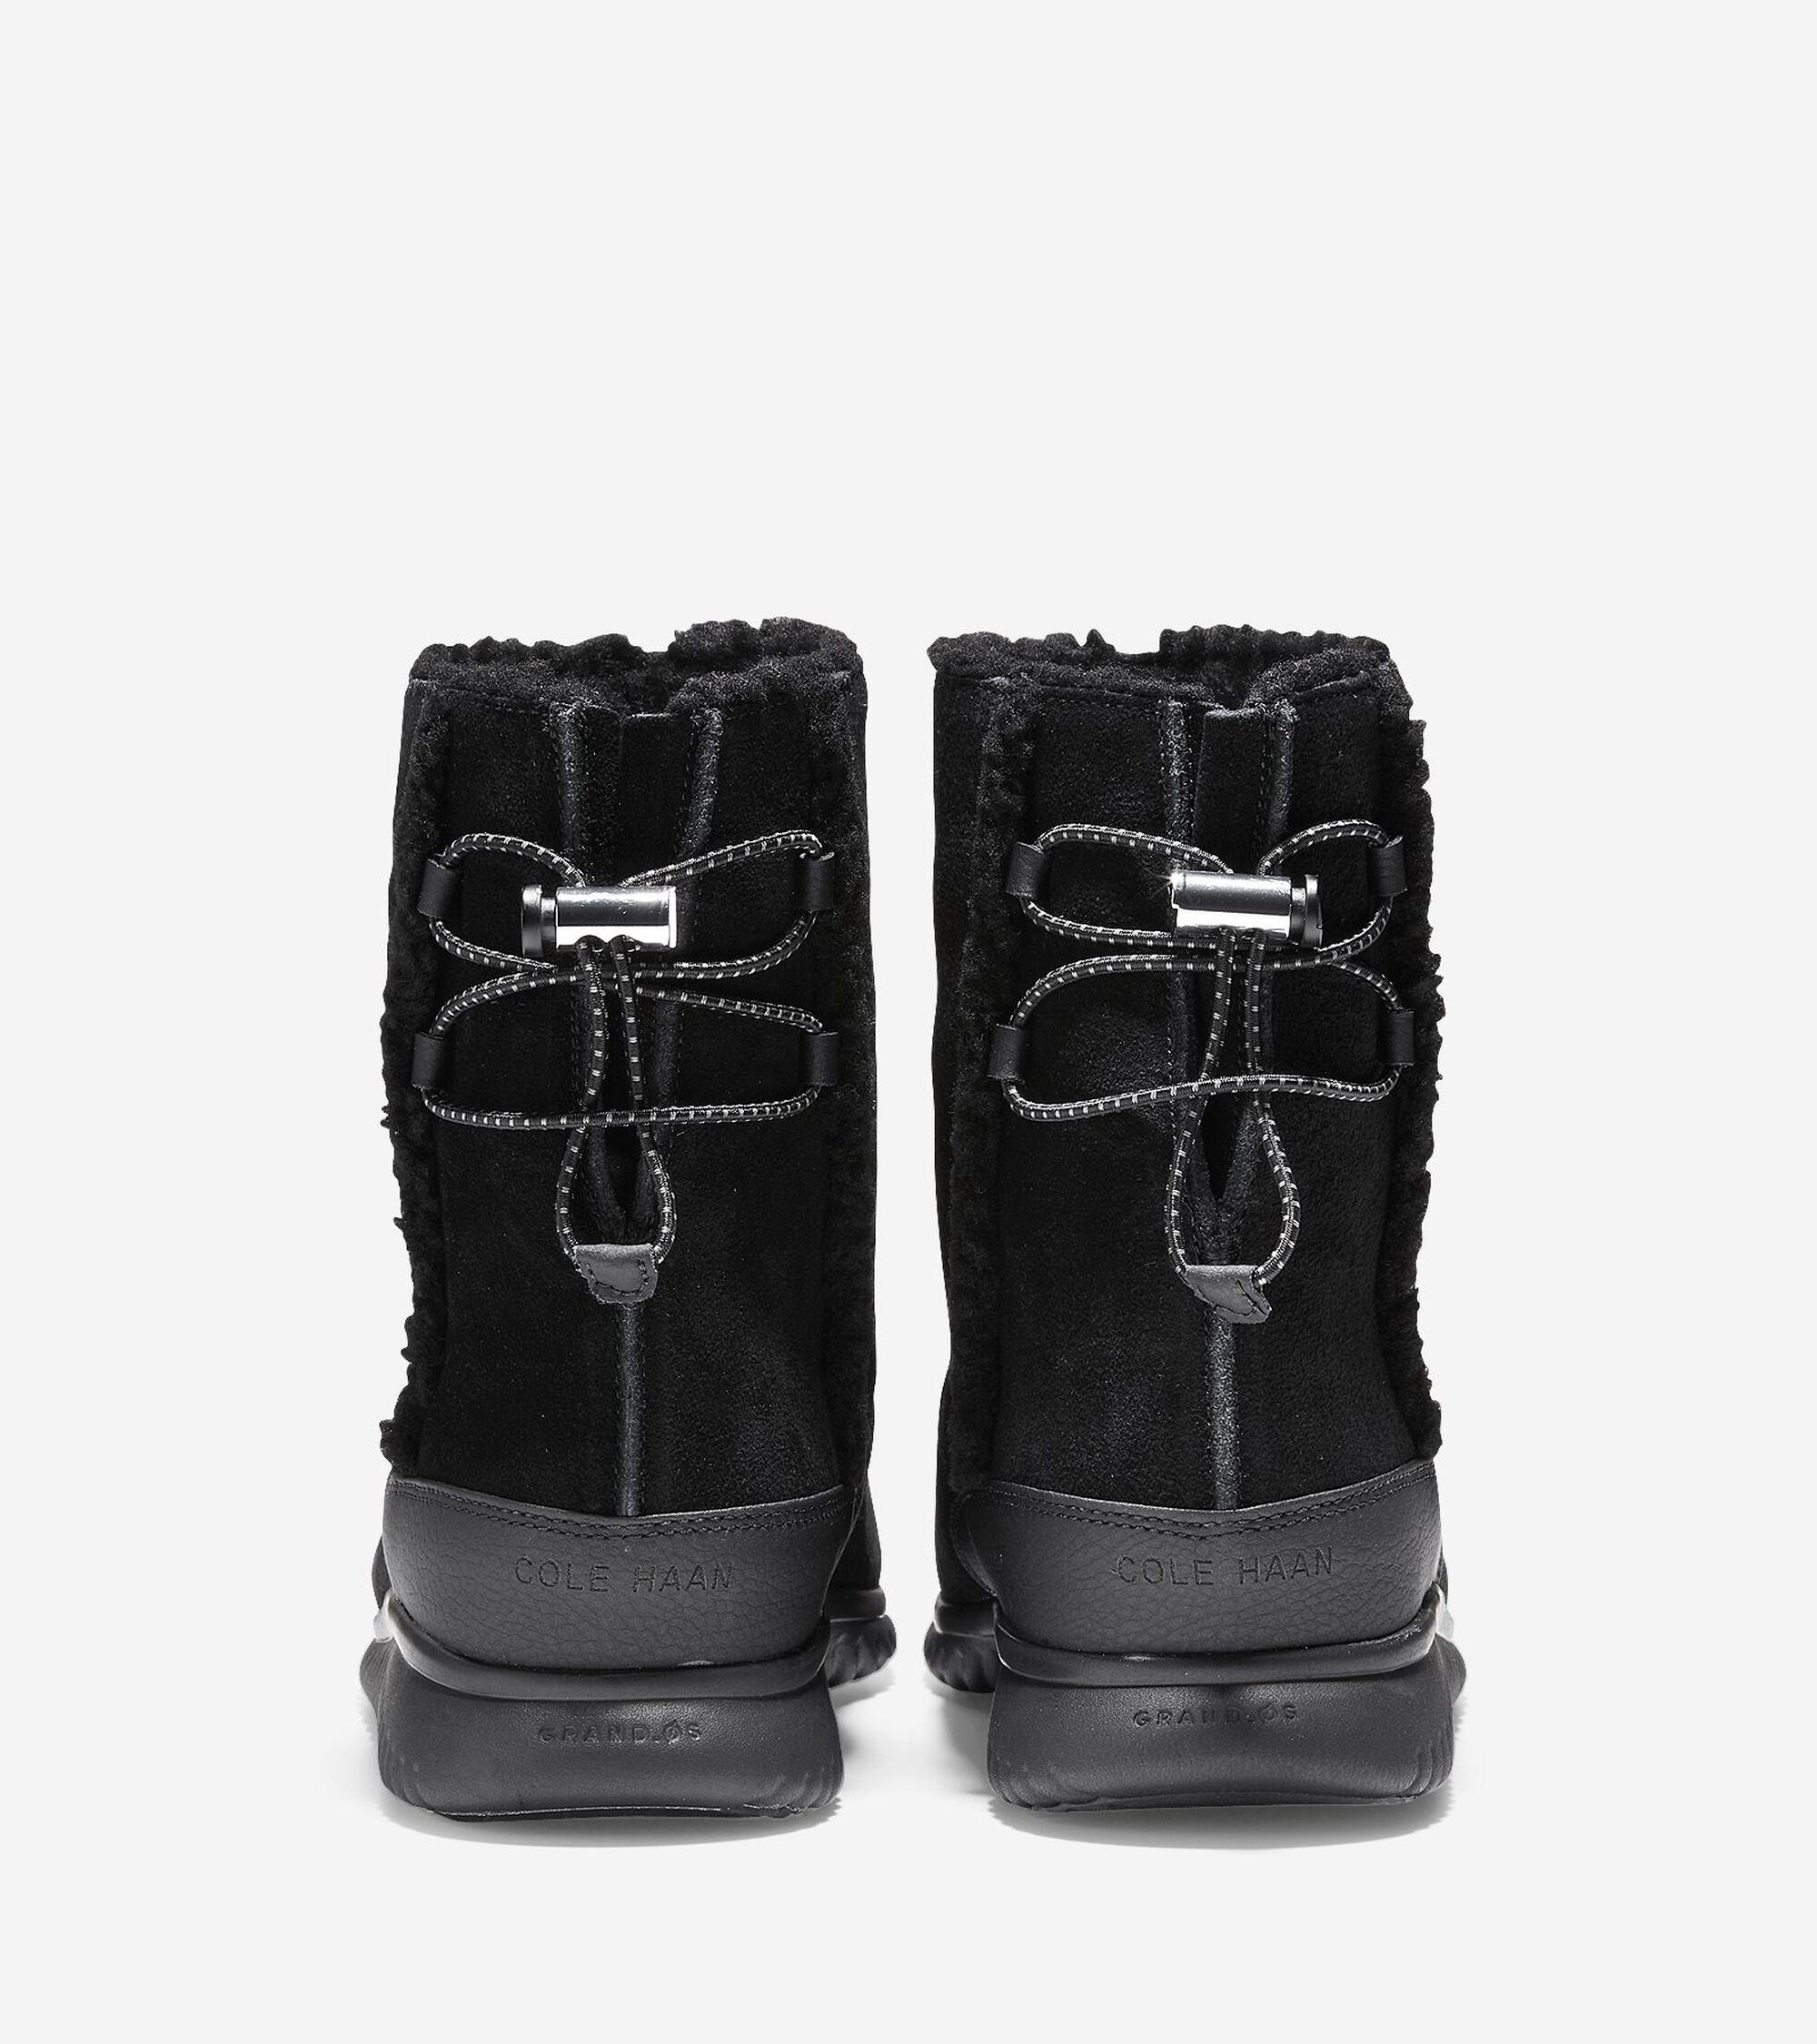 Women s StudioGrand Waterproof Slip-On Boots in Black  9cae7a80d1ab